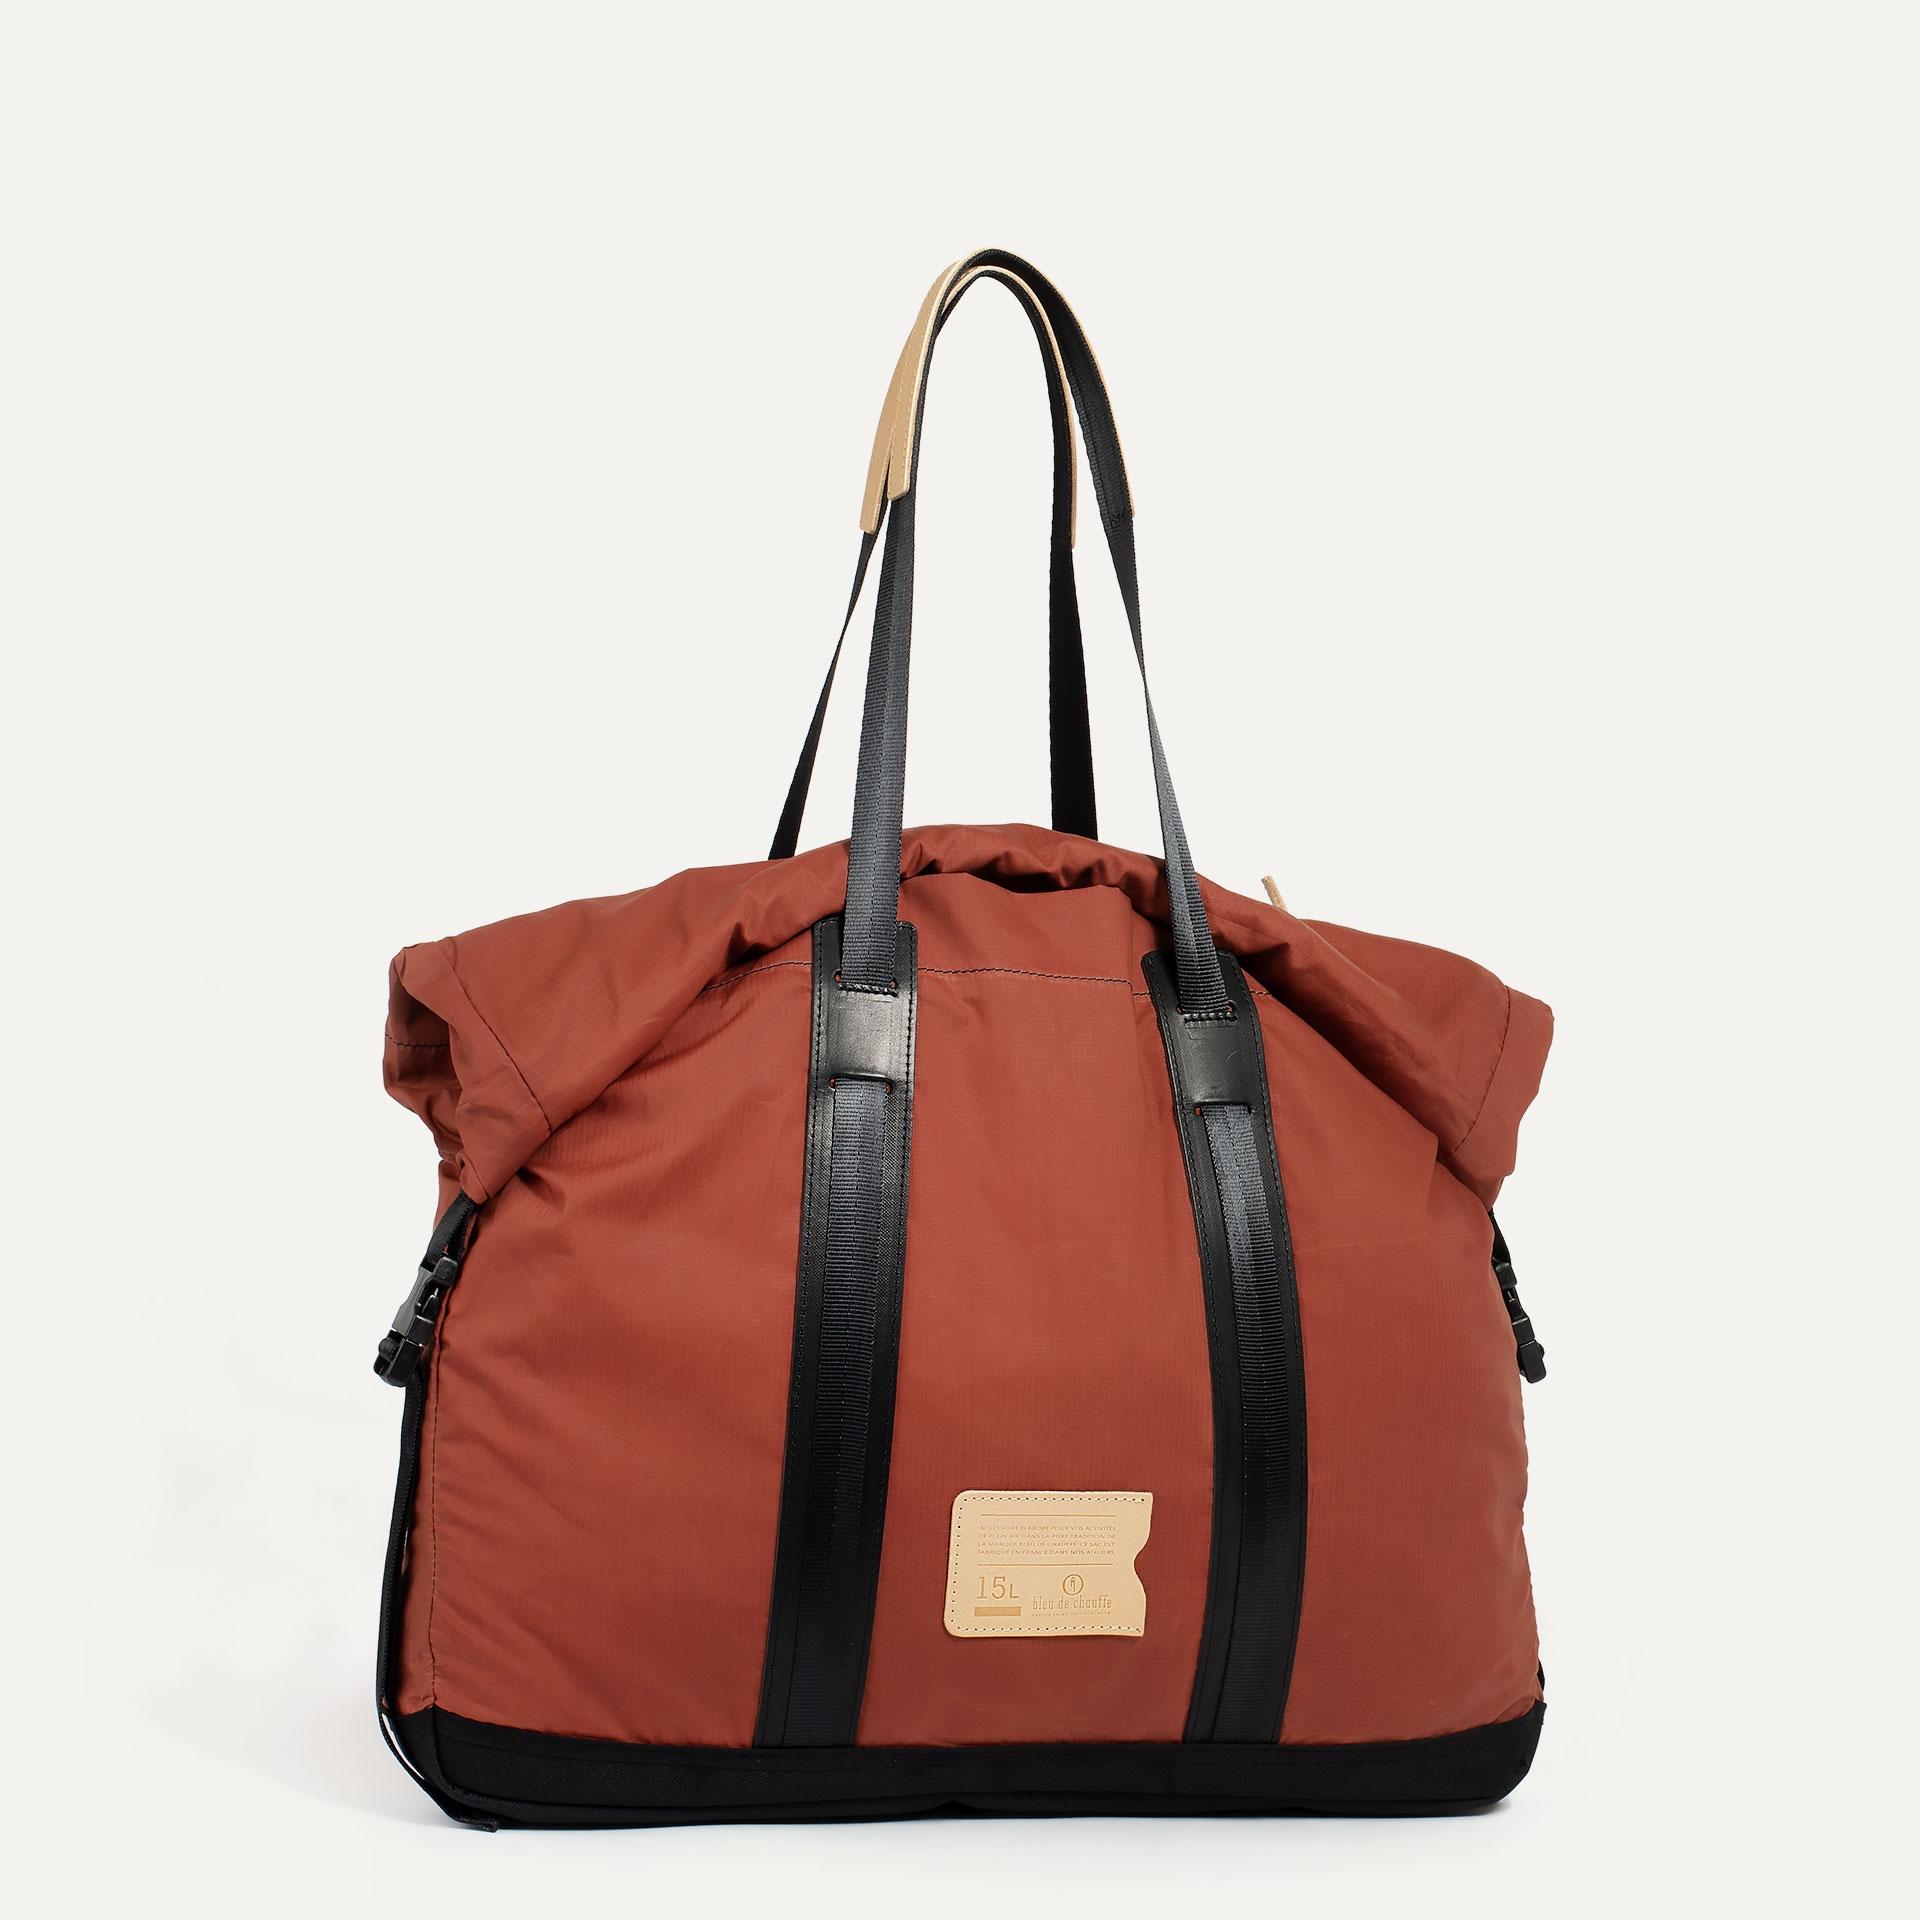 15L Barda Tote bag - Burgundy (image n°2)